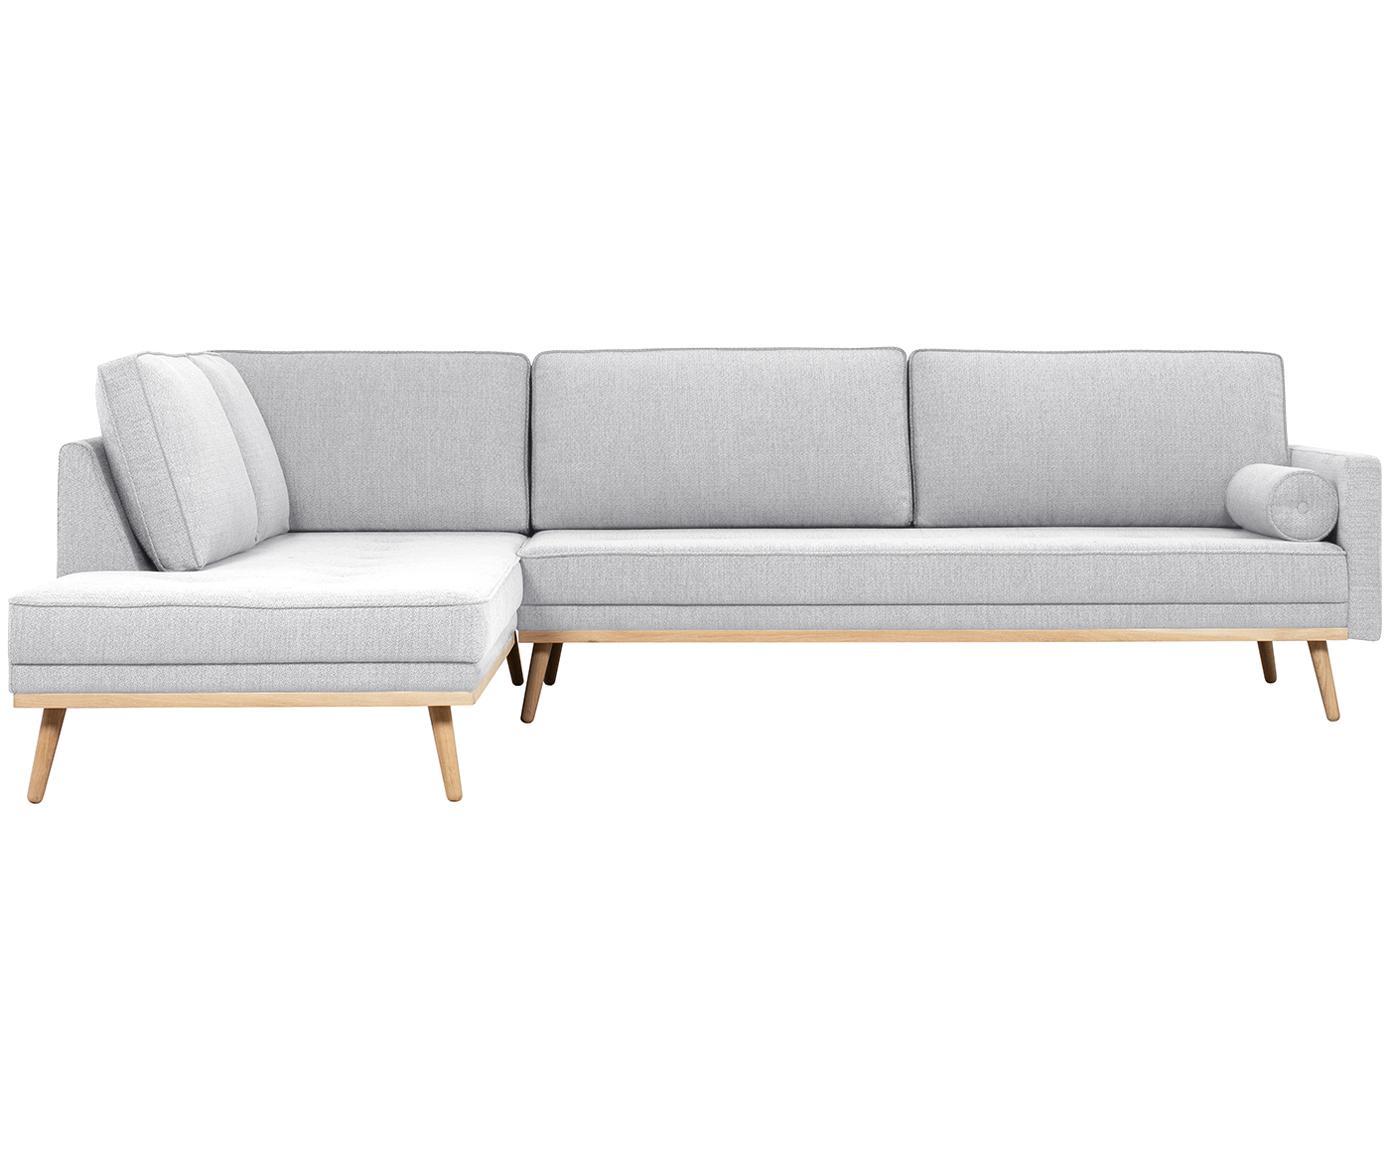 Ecksofa Saint (4-Sitzer), Bezug: Polyester 50.000 Scheuert, Gestell: Massives Kiefernholz, Spa, Webstoff Hellgrau, 294 x 70 cm